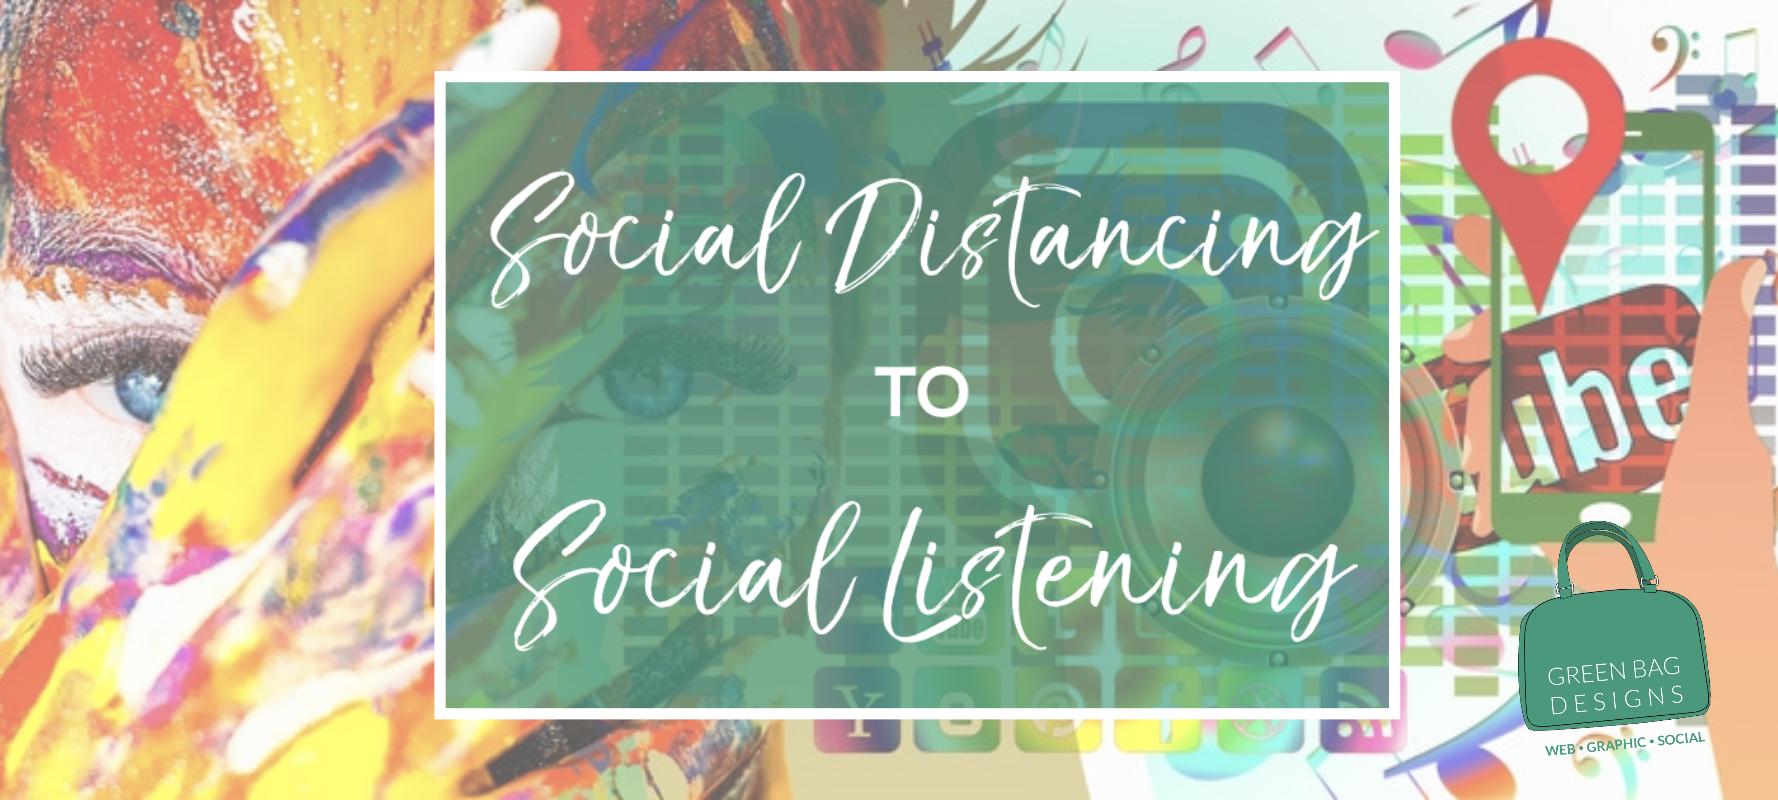 Pinterest Image for Social Distancing for Social Listening